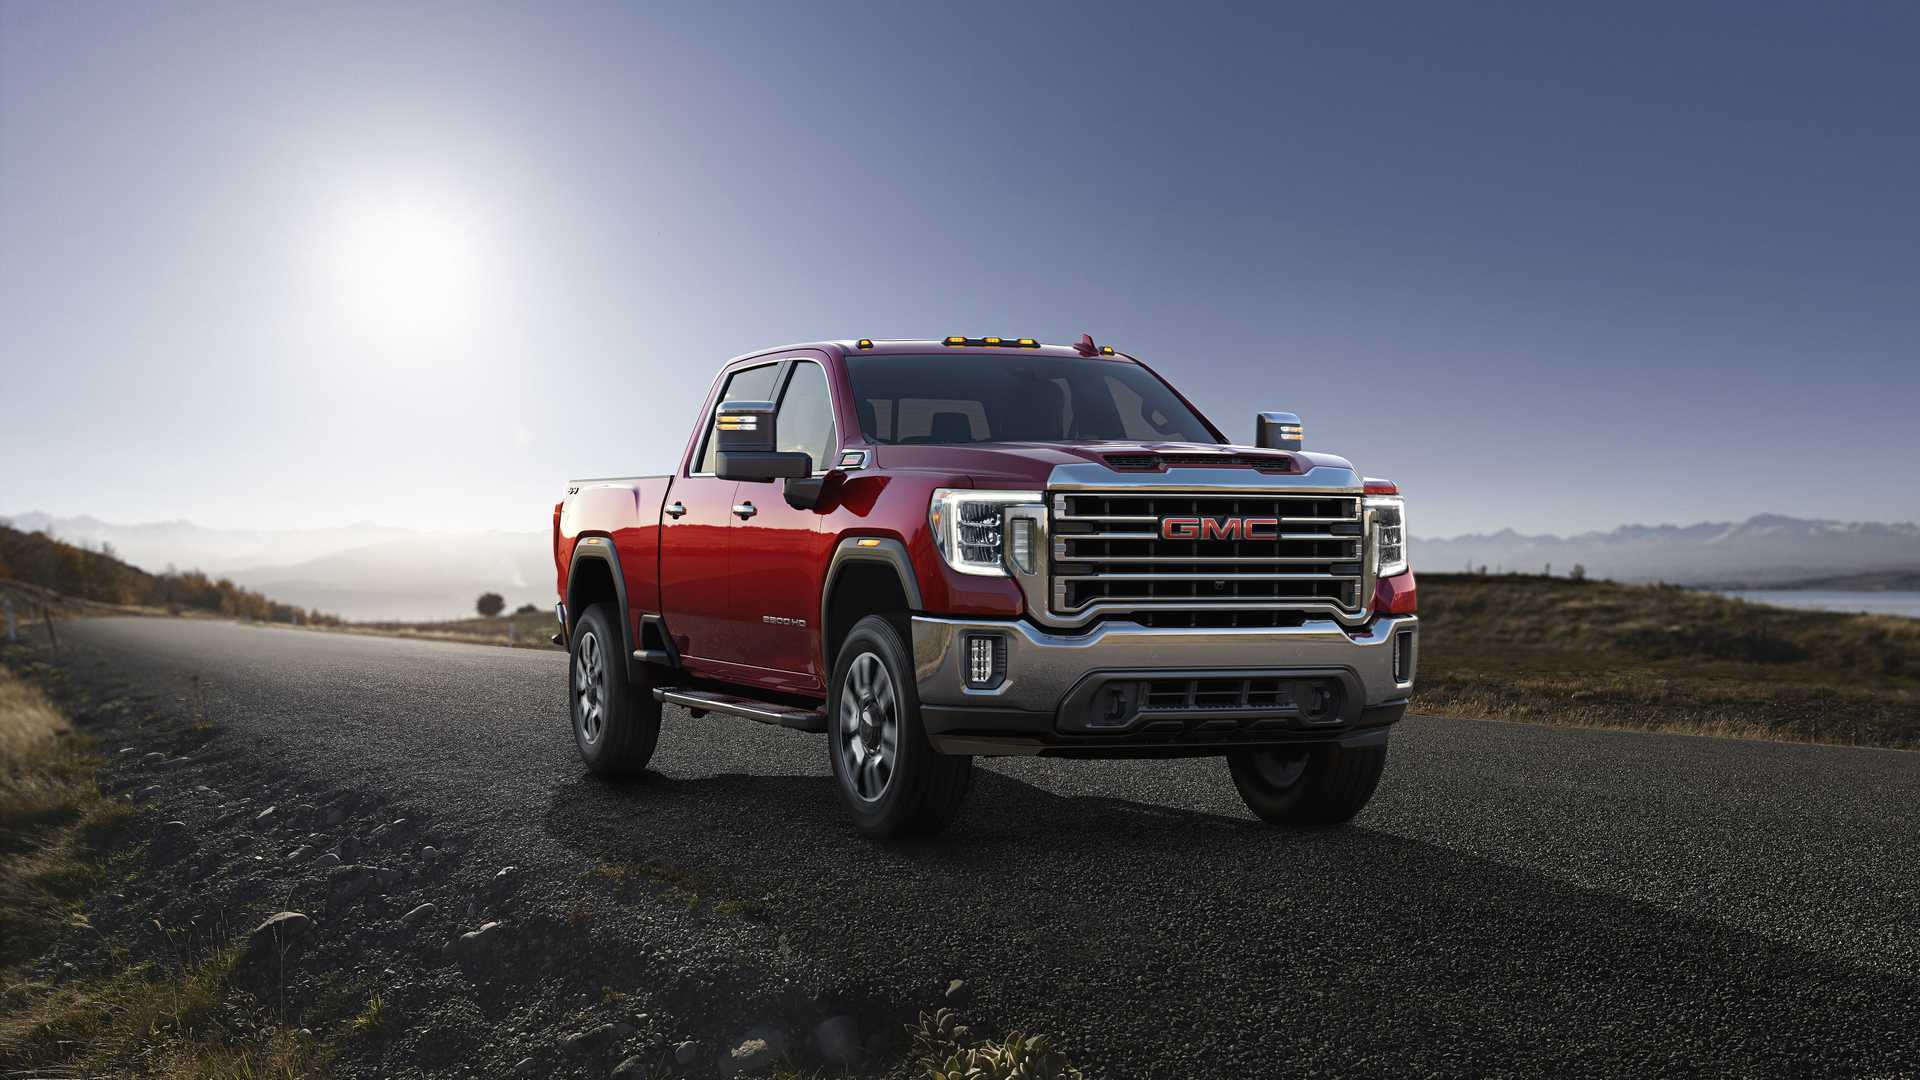 Gm Announces New 1 5-million Vehicle Recall